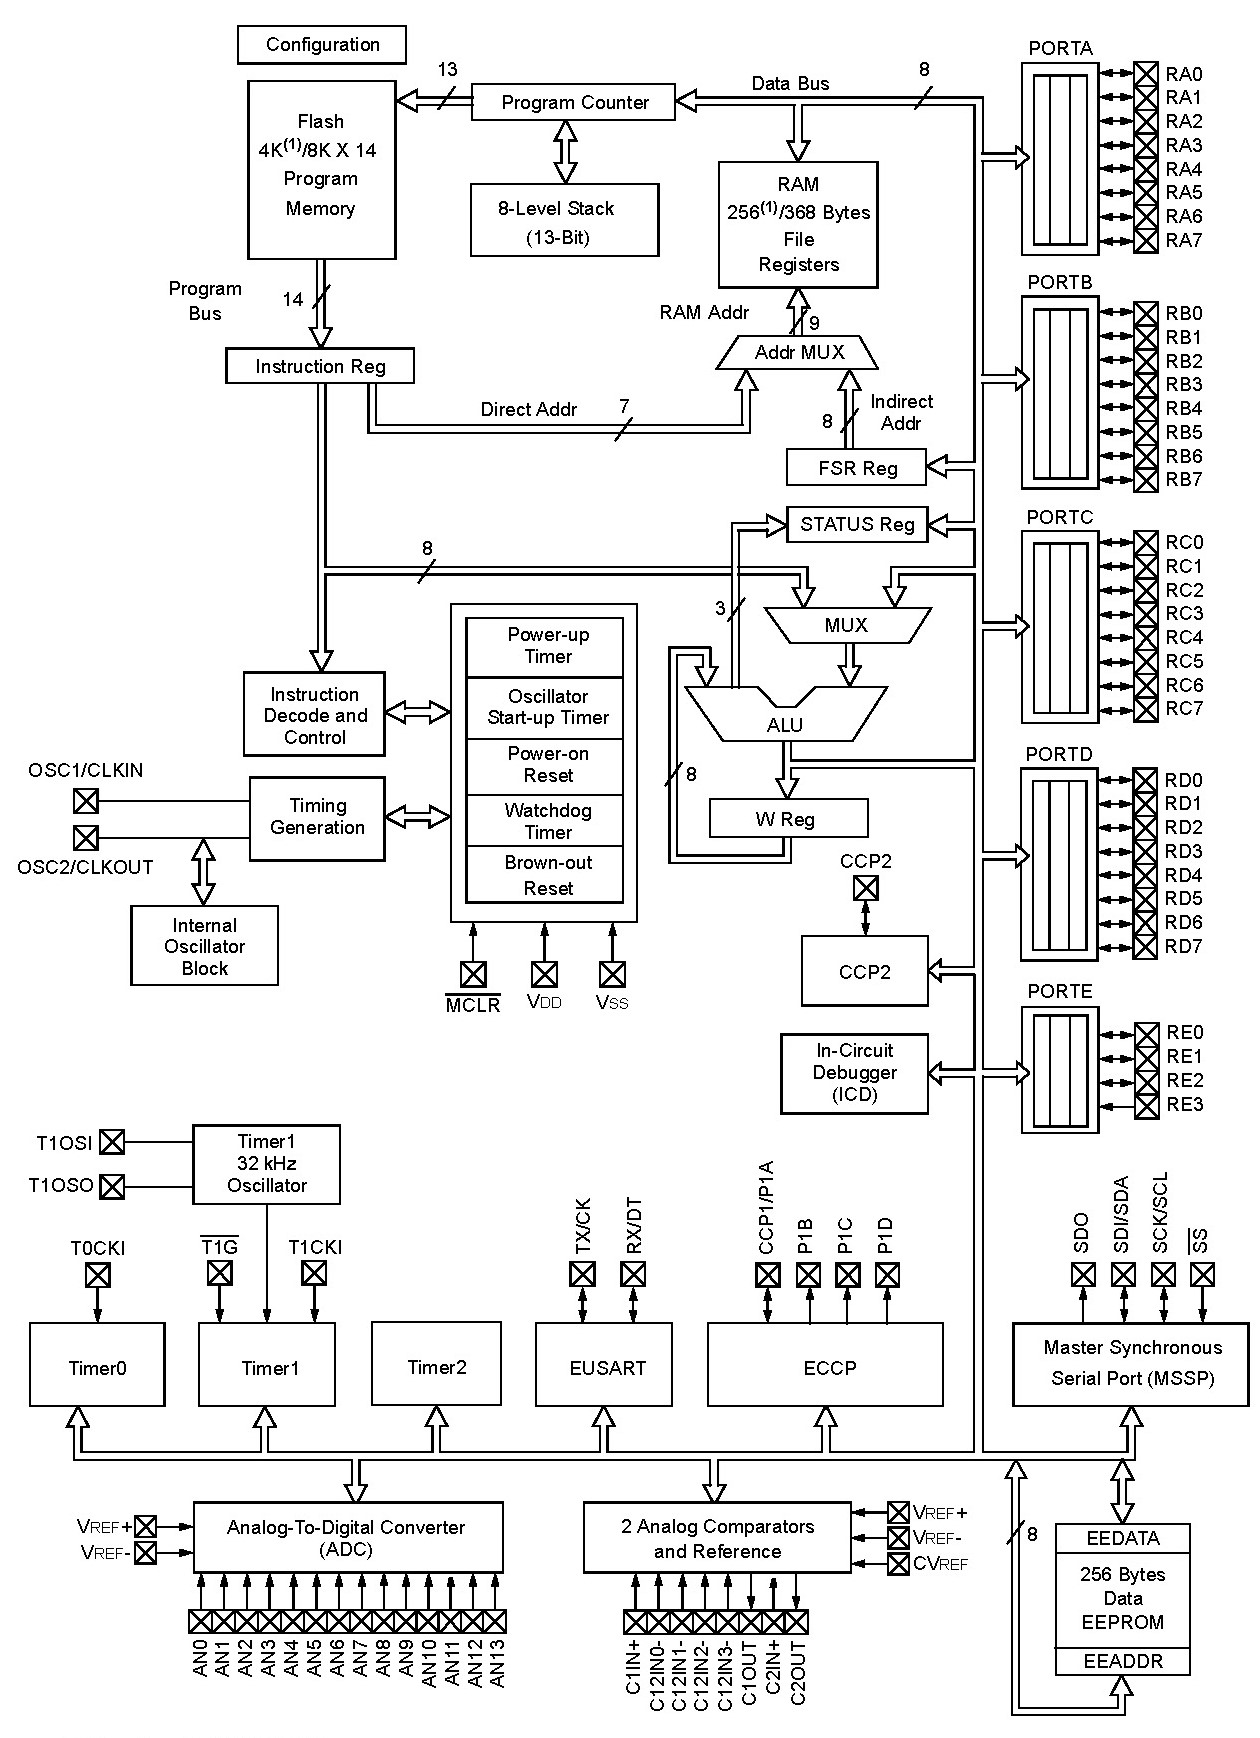 PIC16f887 Microcontroller Pinout, Programming